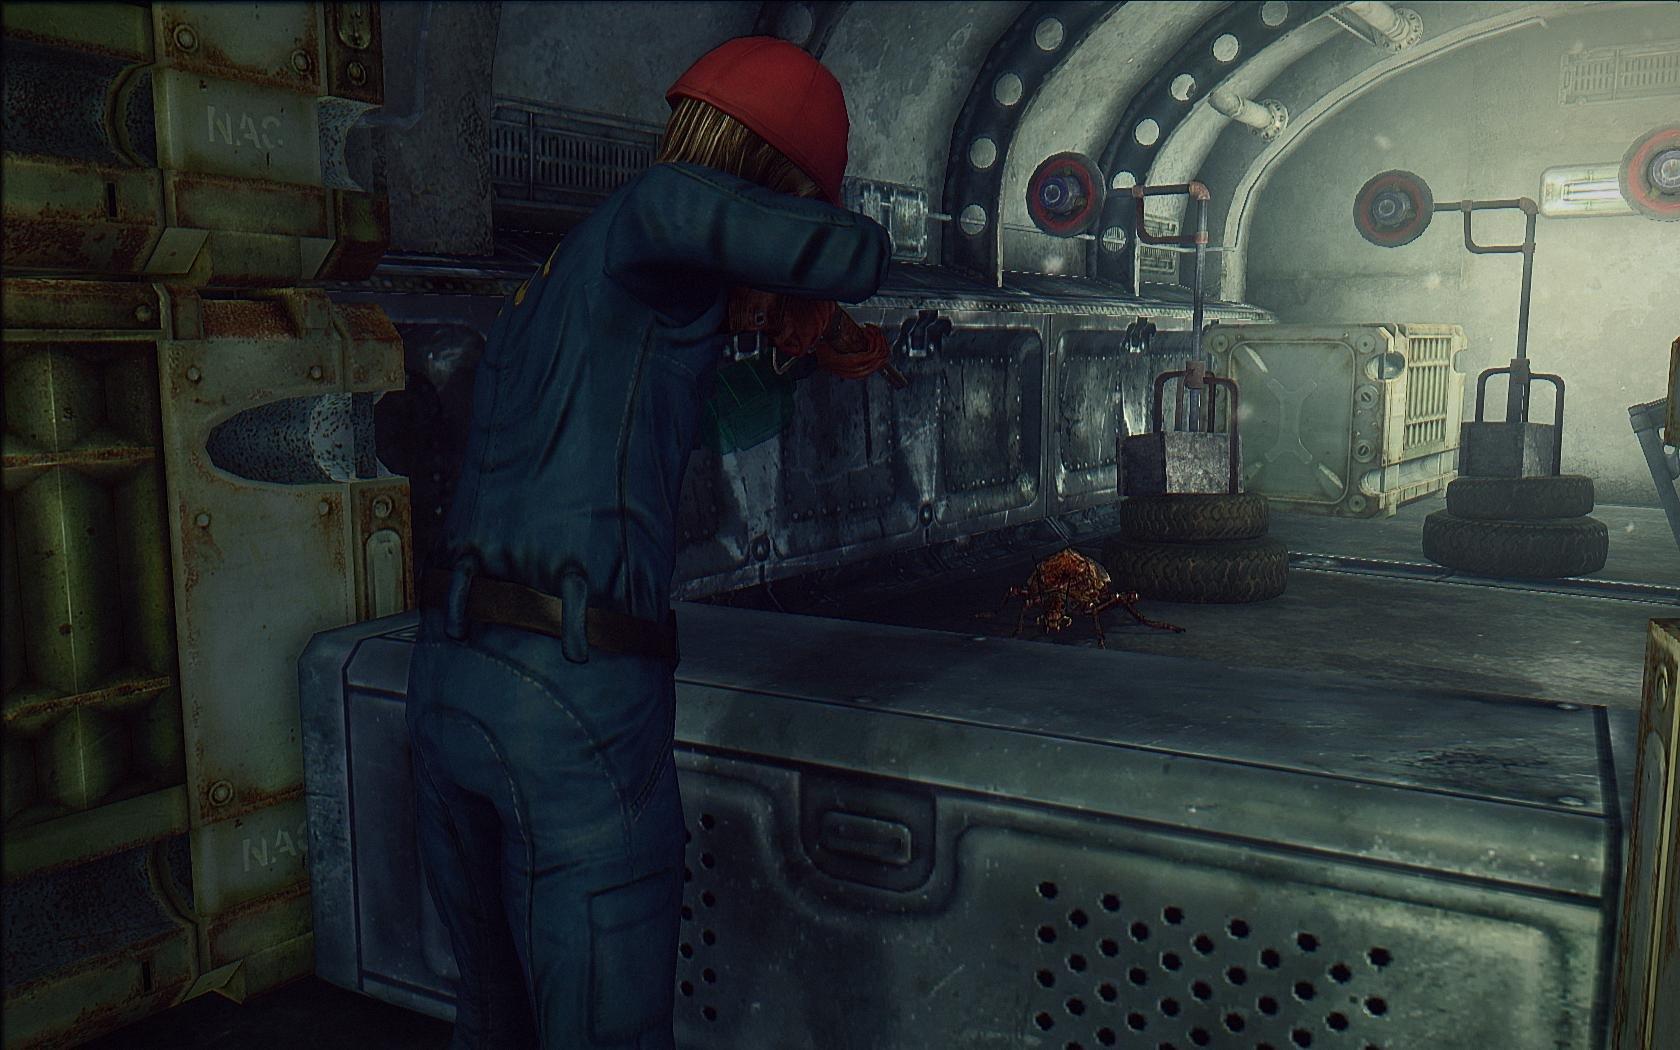 Fallout3 2018-10-01 21-39-54-16.jpg